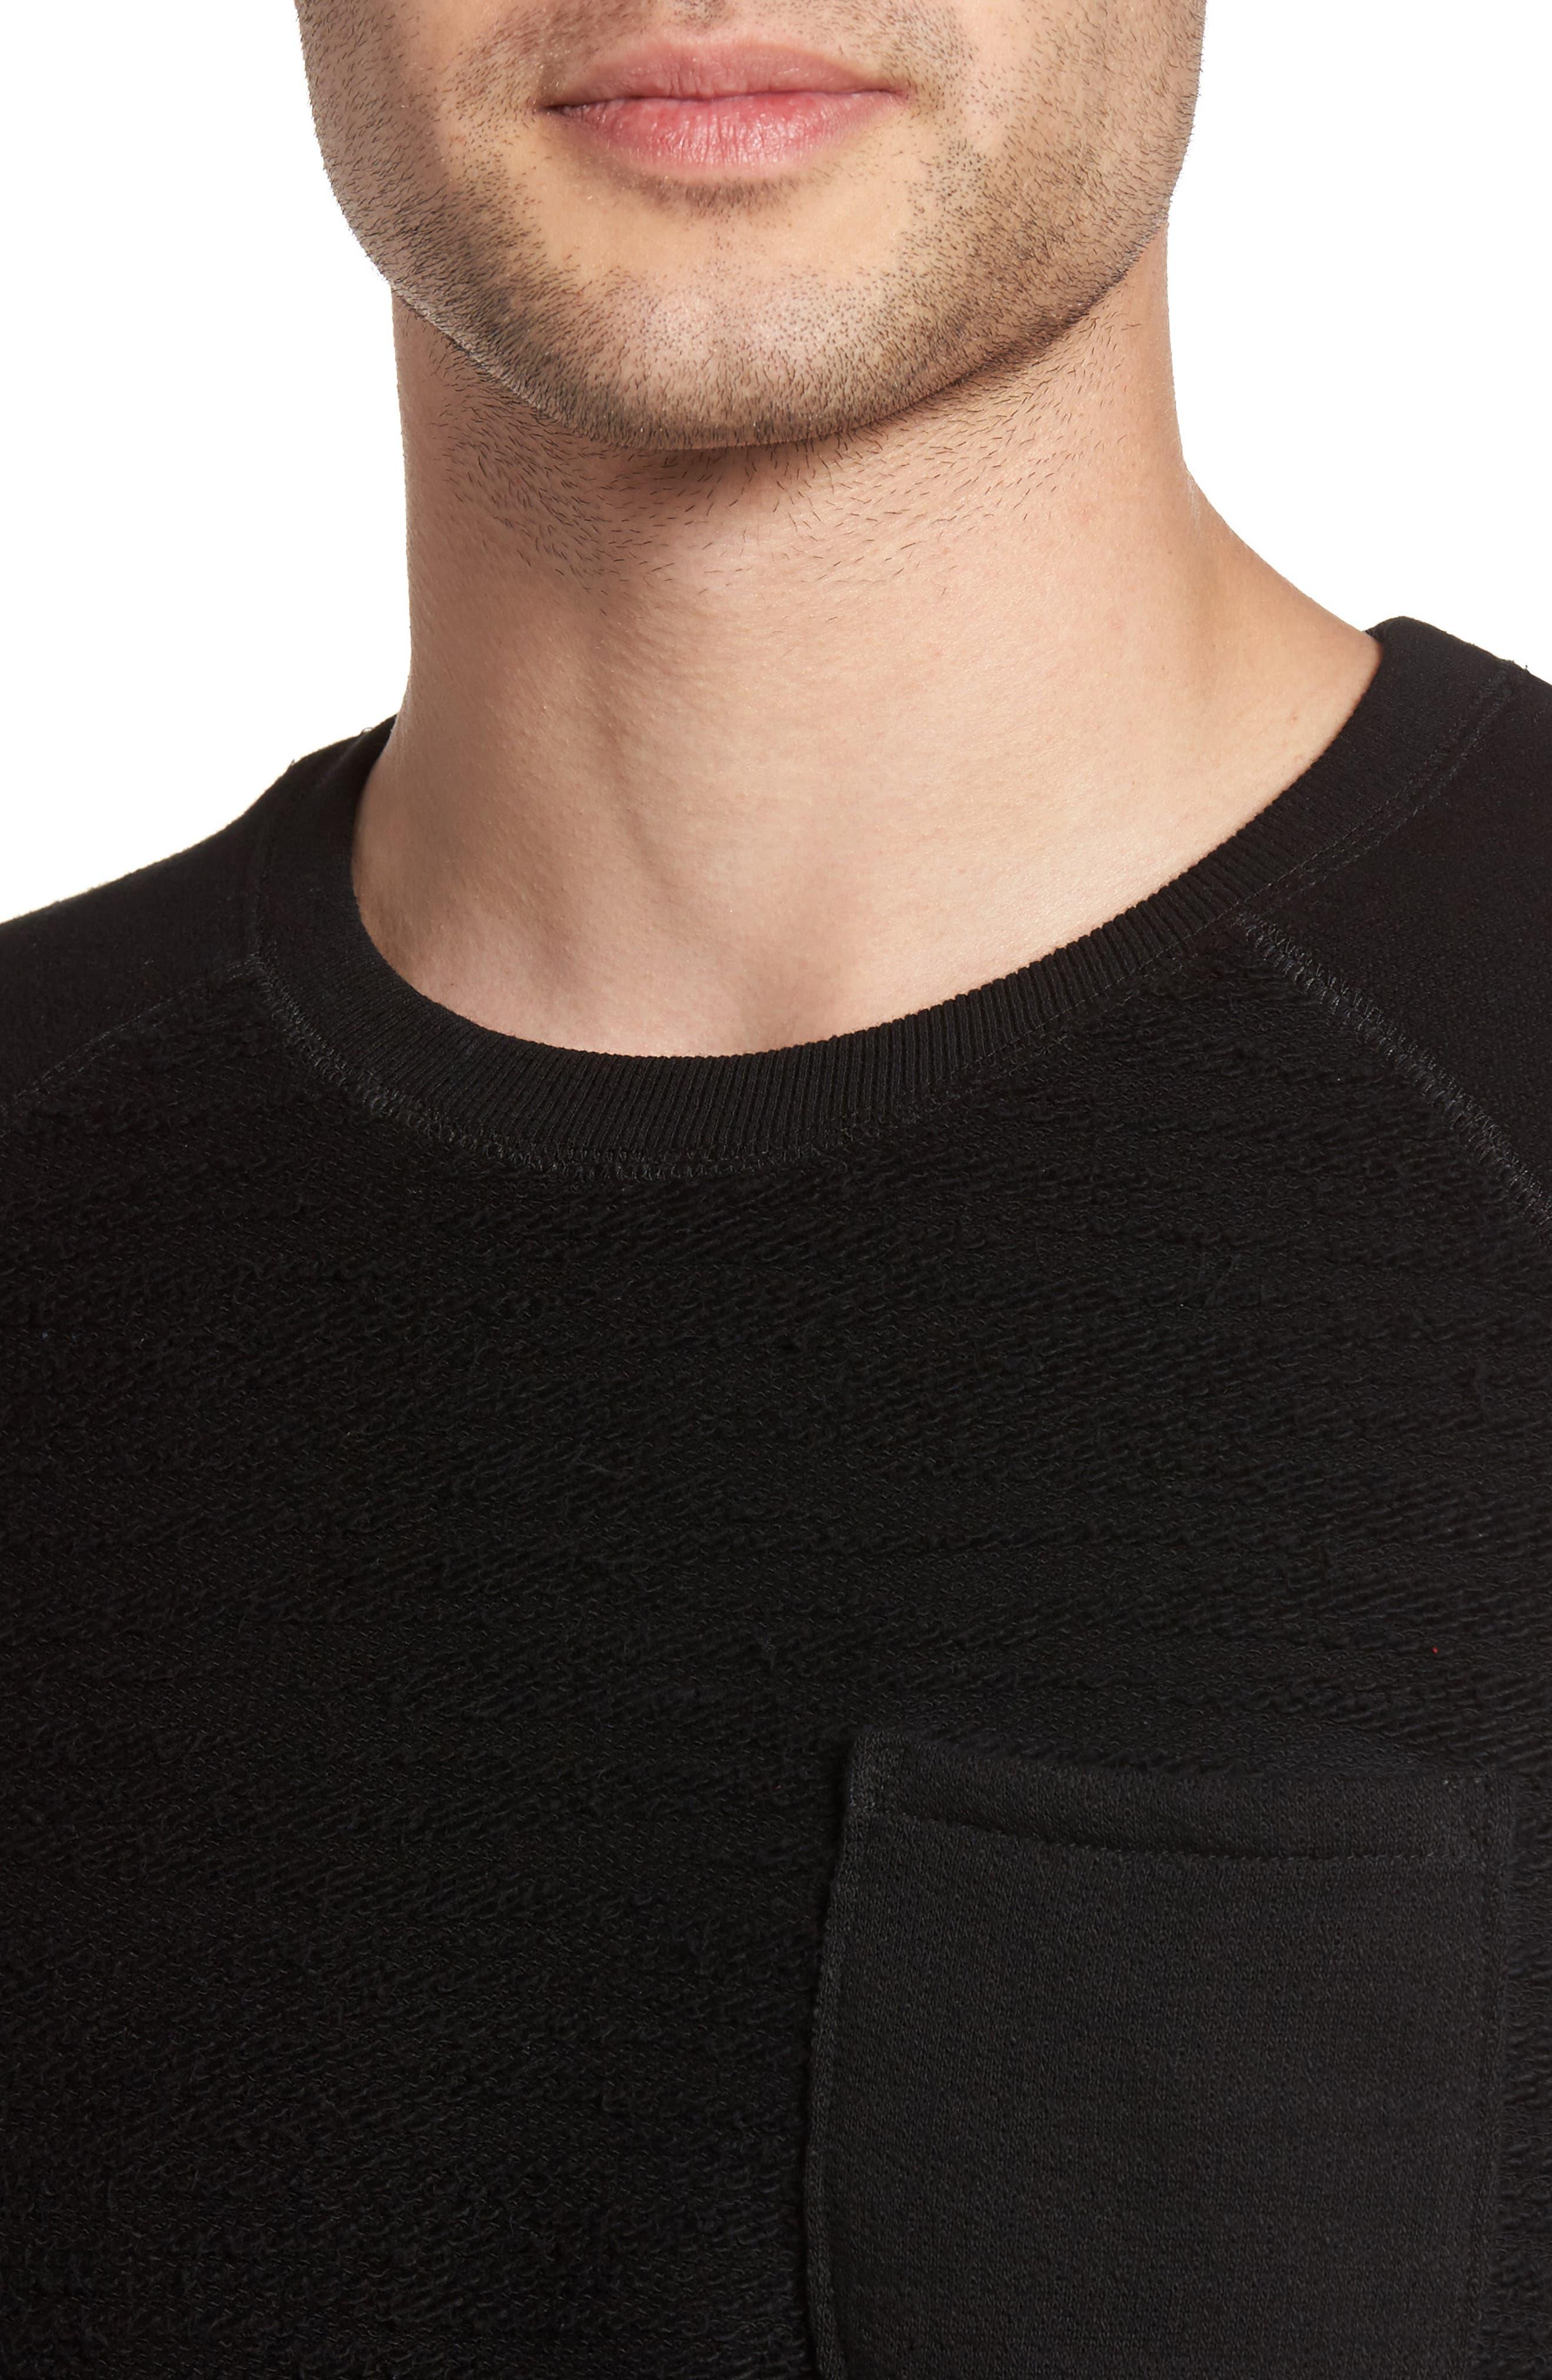 Frey Slubbed Pocket Sweatshirt,                             Alternate thumbnail 4, color,                             001